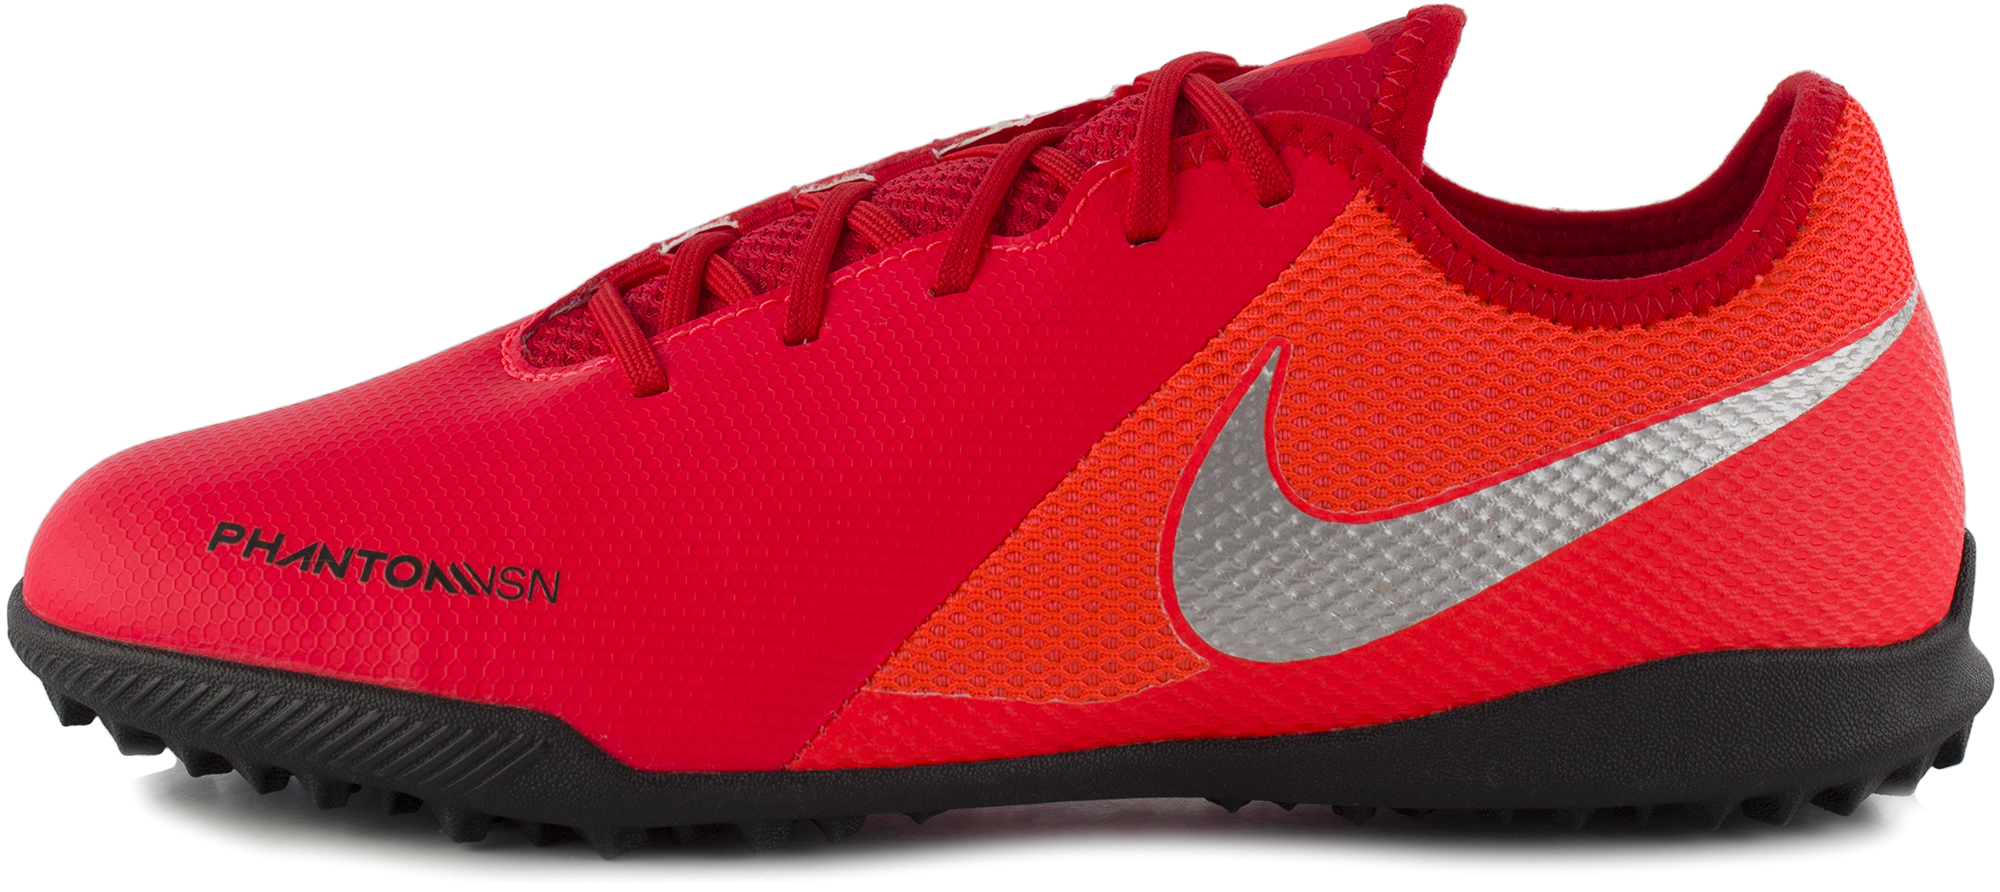 Nike Бутсы для мальчиков Nike Phantom Vsn Academy TF, размер 34,5 цена 2017